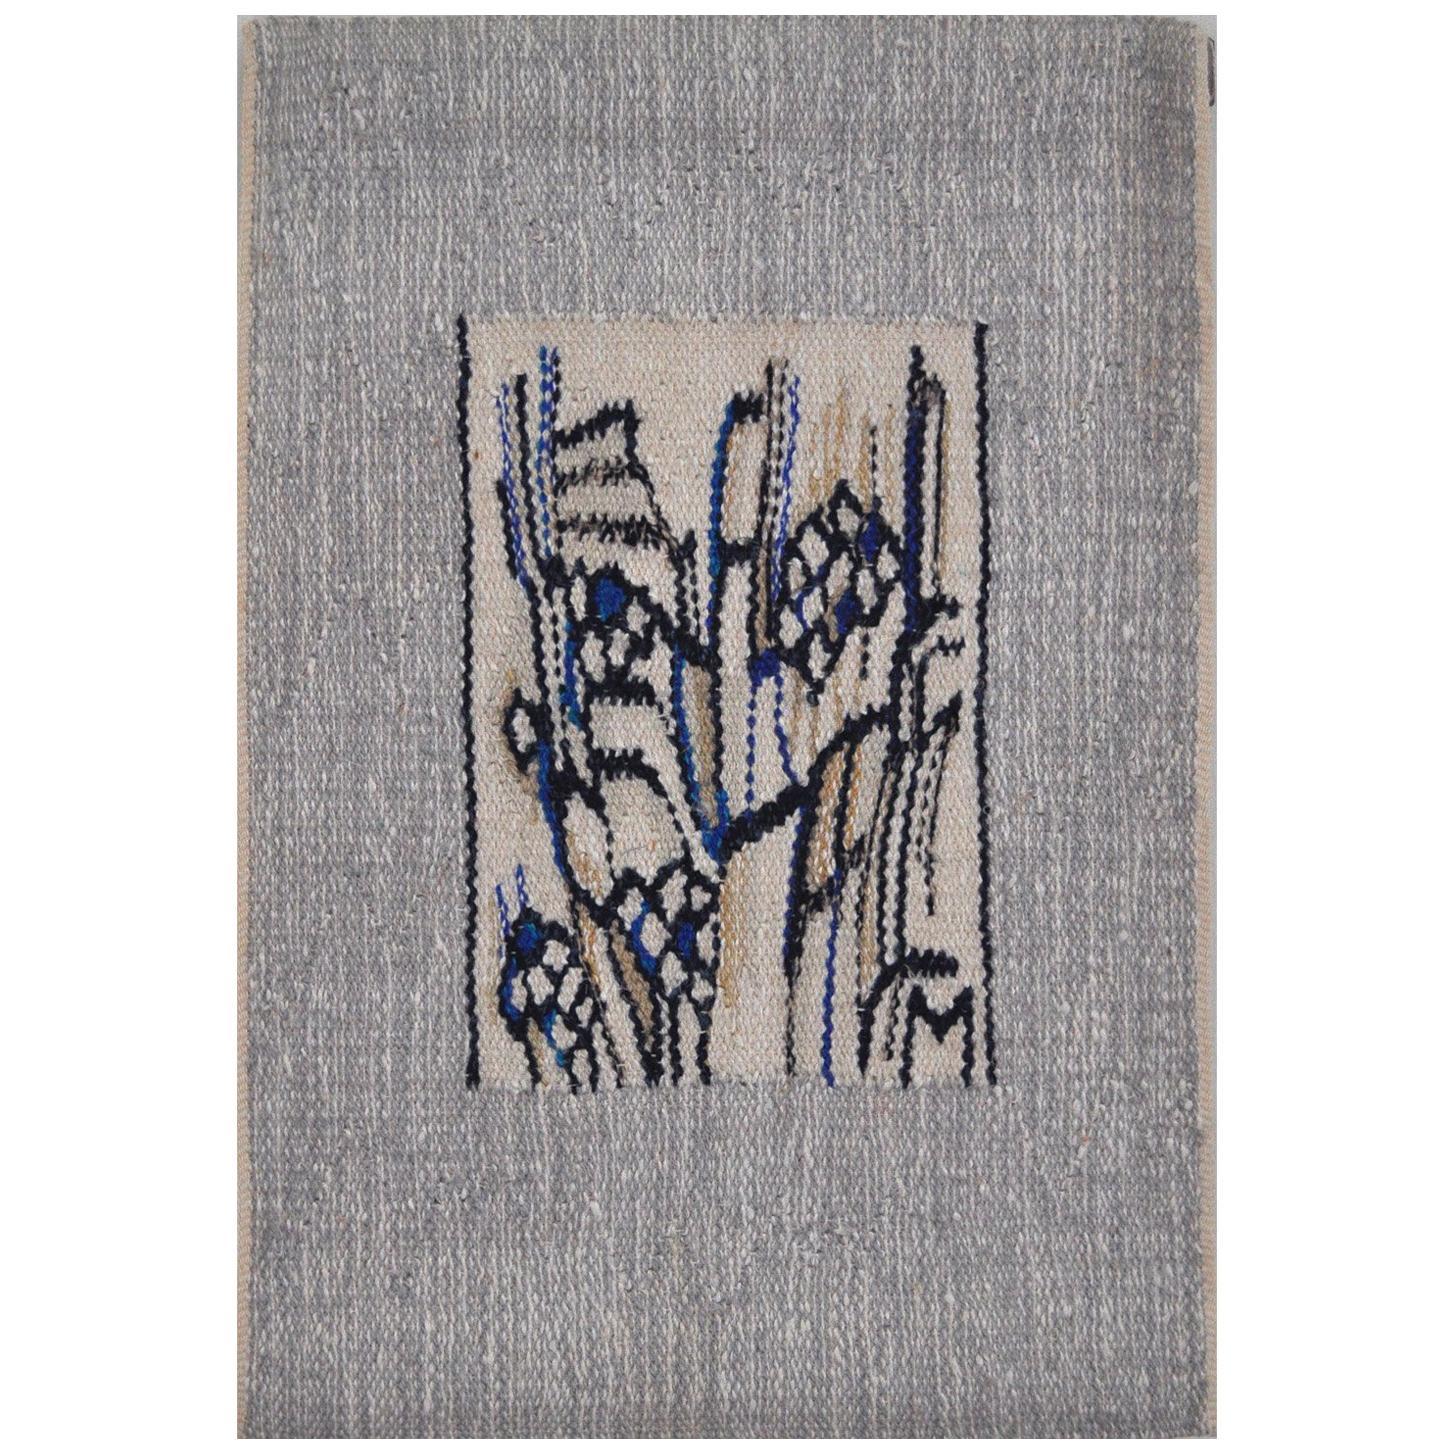 Abstract Handwoven Wall Tapestry by the Danish Artist Mette Birckner